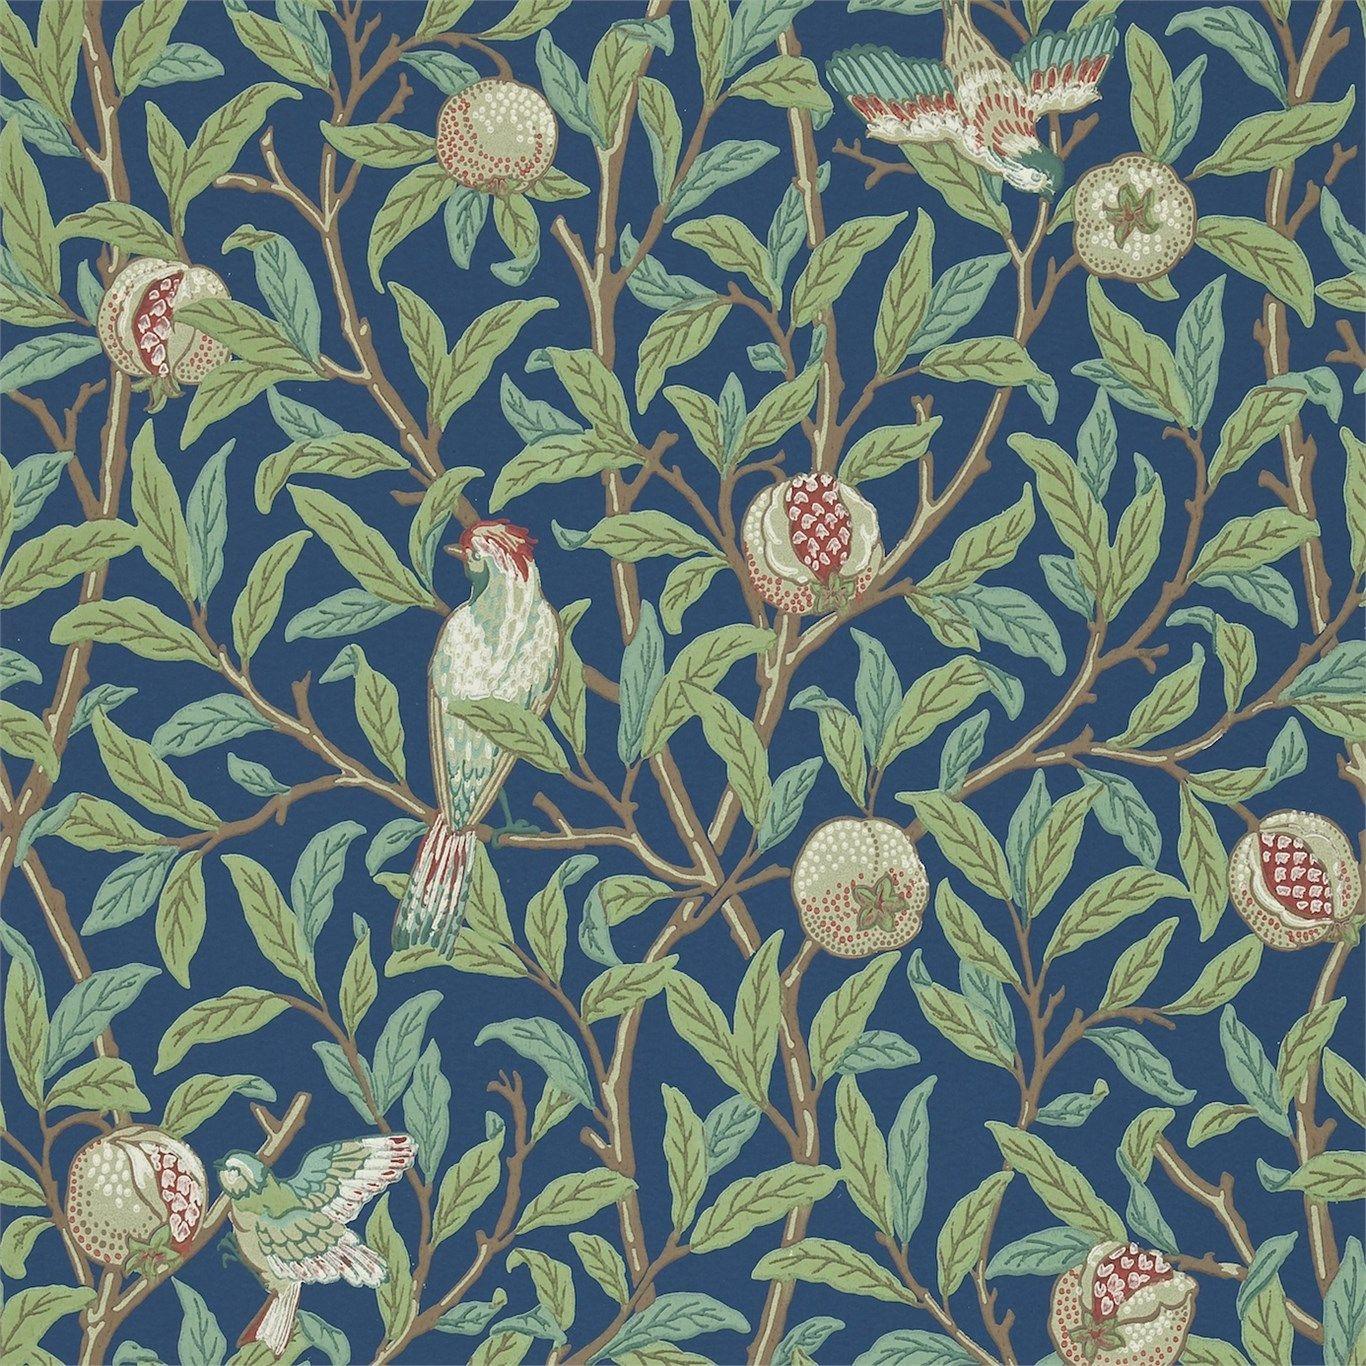 Bird Pomegranate 212540 William Morris Wallpaper Morris Wallpapers William Morris Art